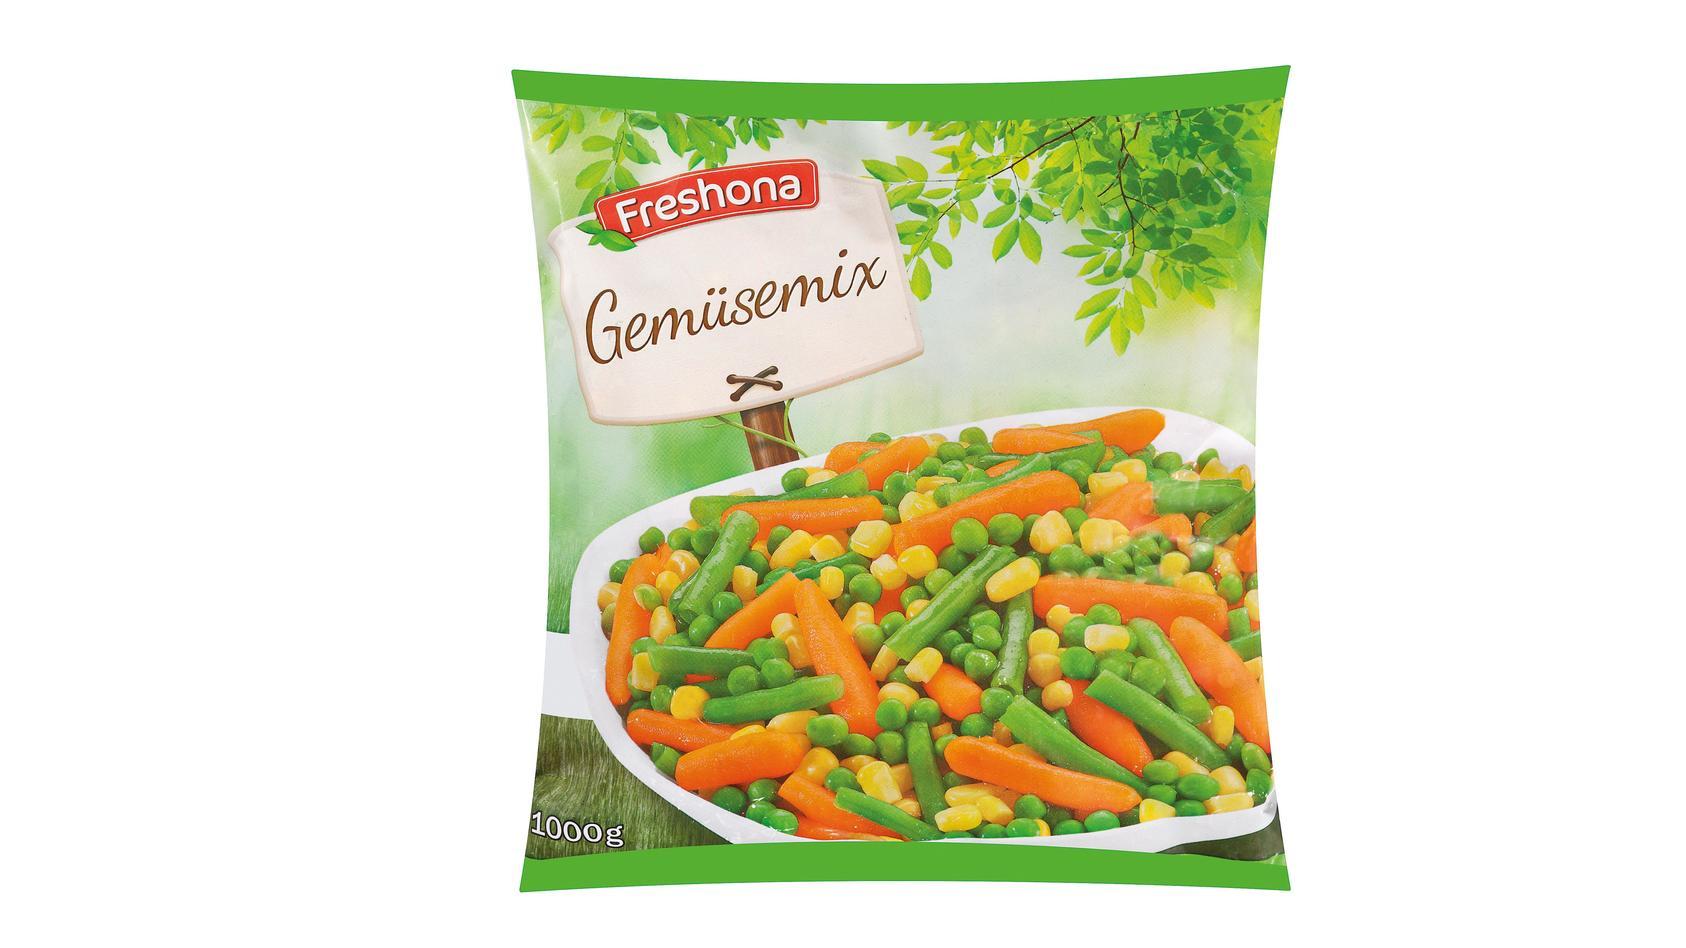 "Listerien-Gefahr: Lidl ruft das Produkt ""Freshona Gemüsemix, 1000 g"" zurück"